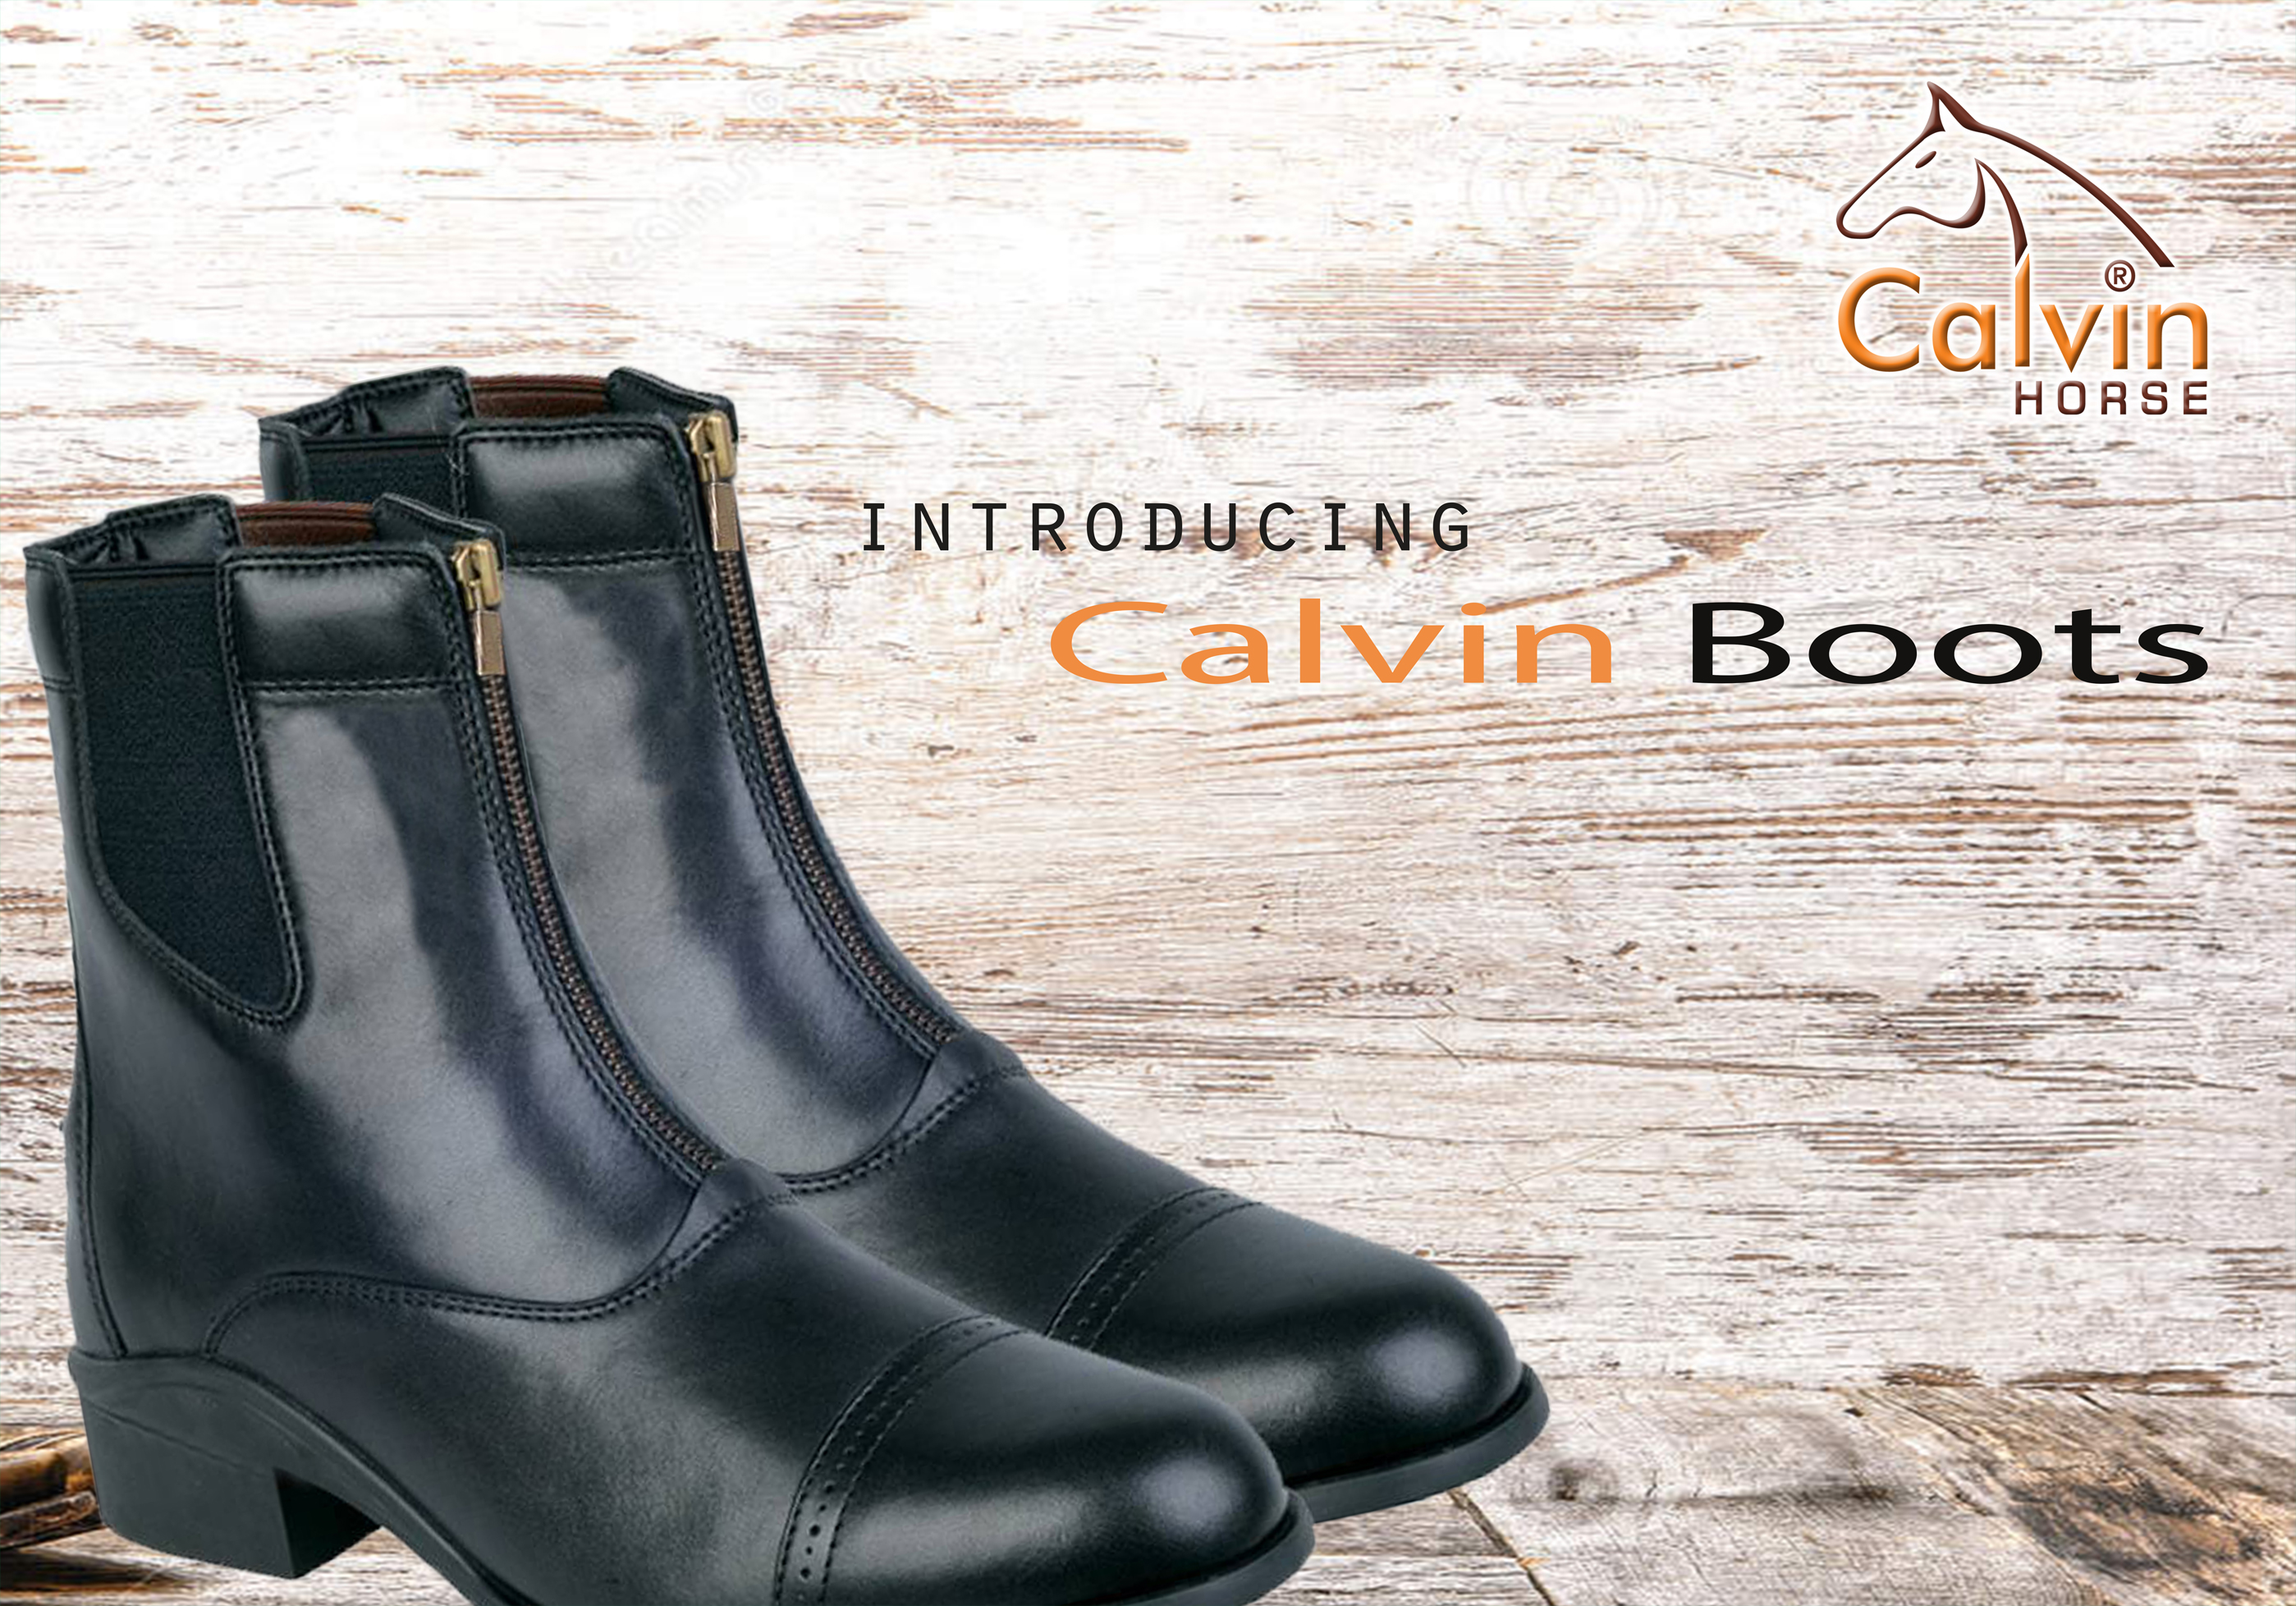 Calvin Horse Boots